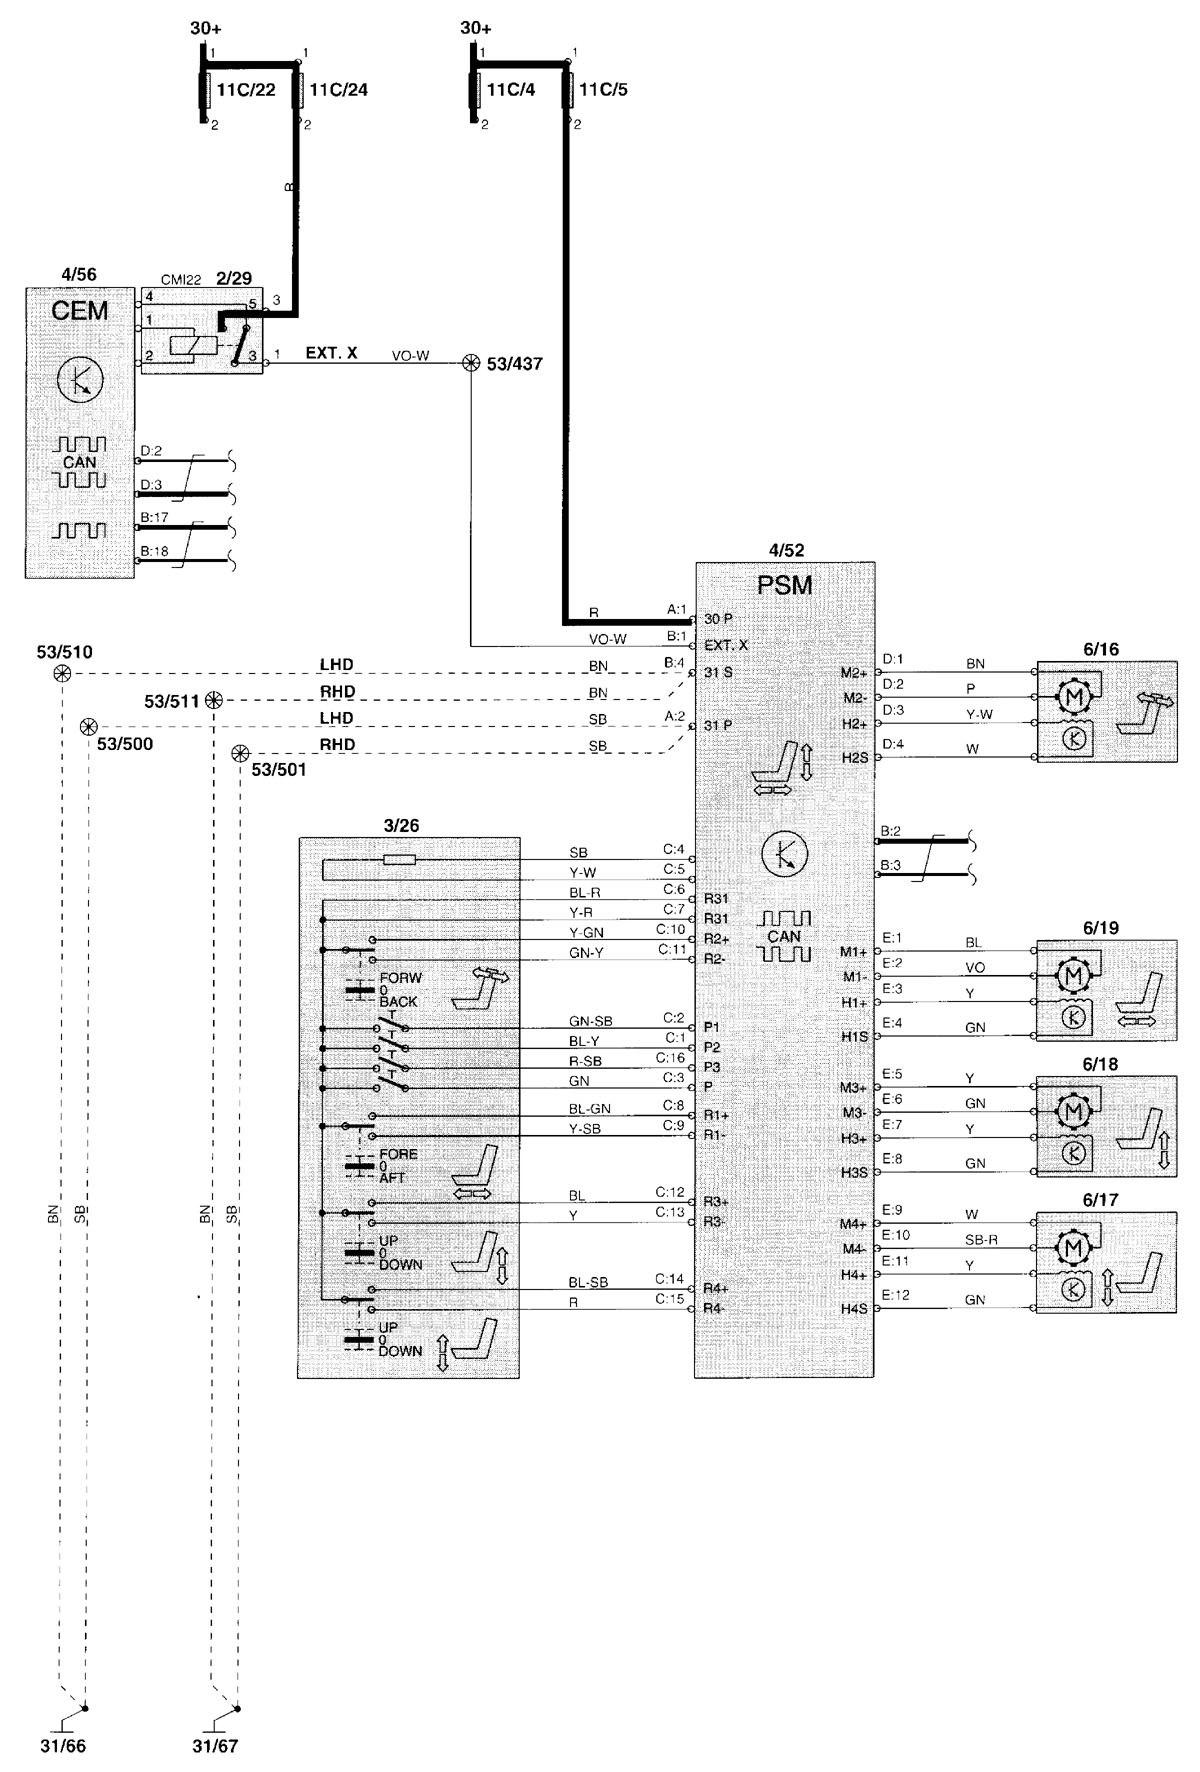 Fabulous Wrg 6273 2002 Volvo S60 Engine Diagram Wiring Cloud Xempagosophoxytasticioscodnessplanboapumohammedshrineorg